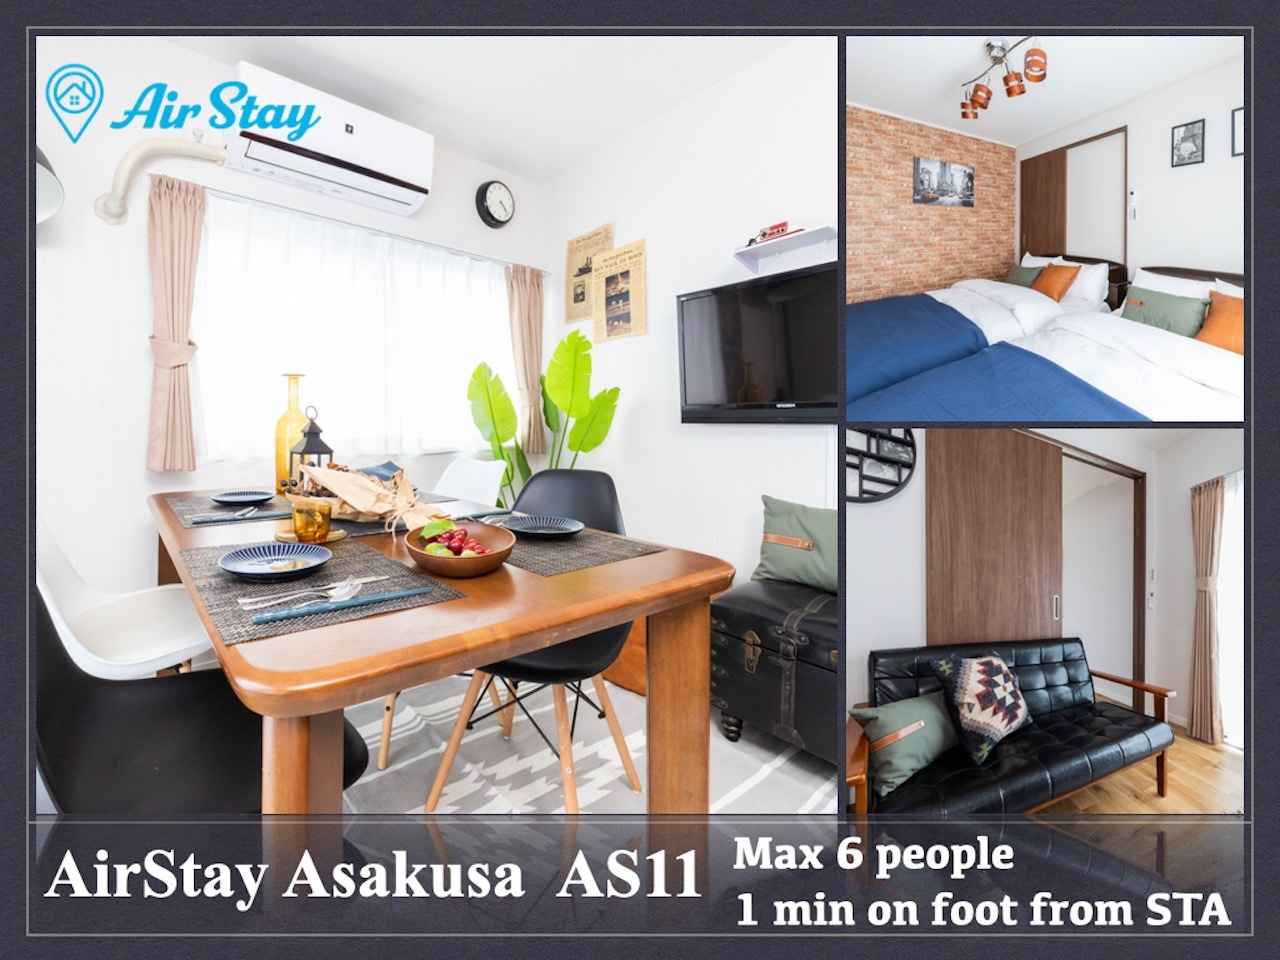 AirStay浅草AS11 /帰国滞在歓迎/早割長期割/空港ピックアップ/高速WiFi